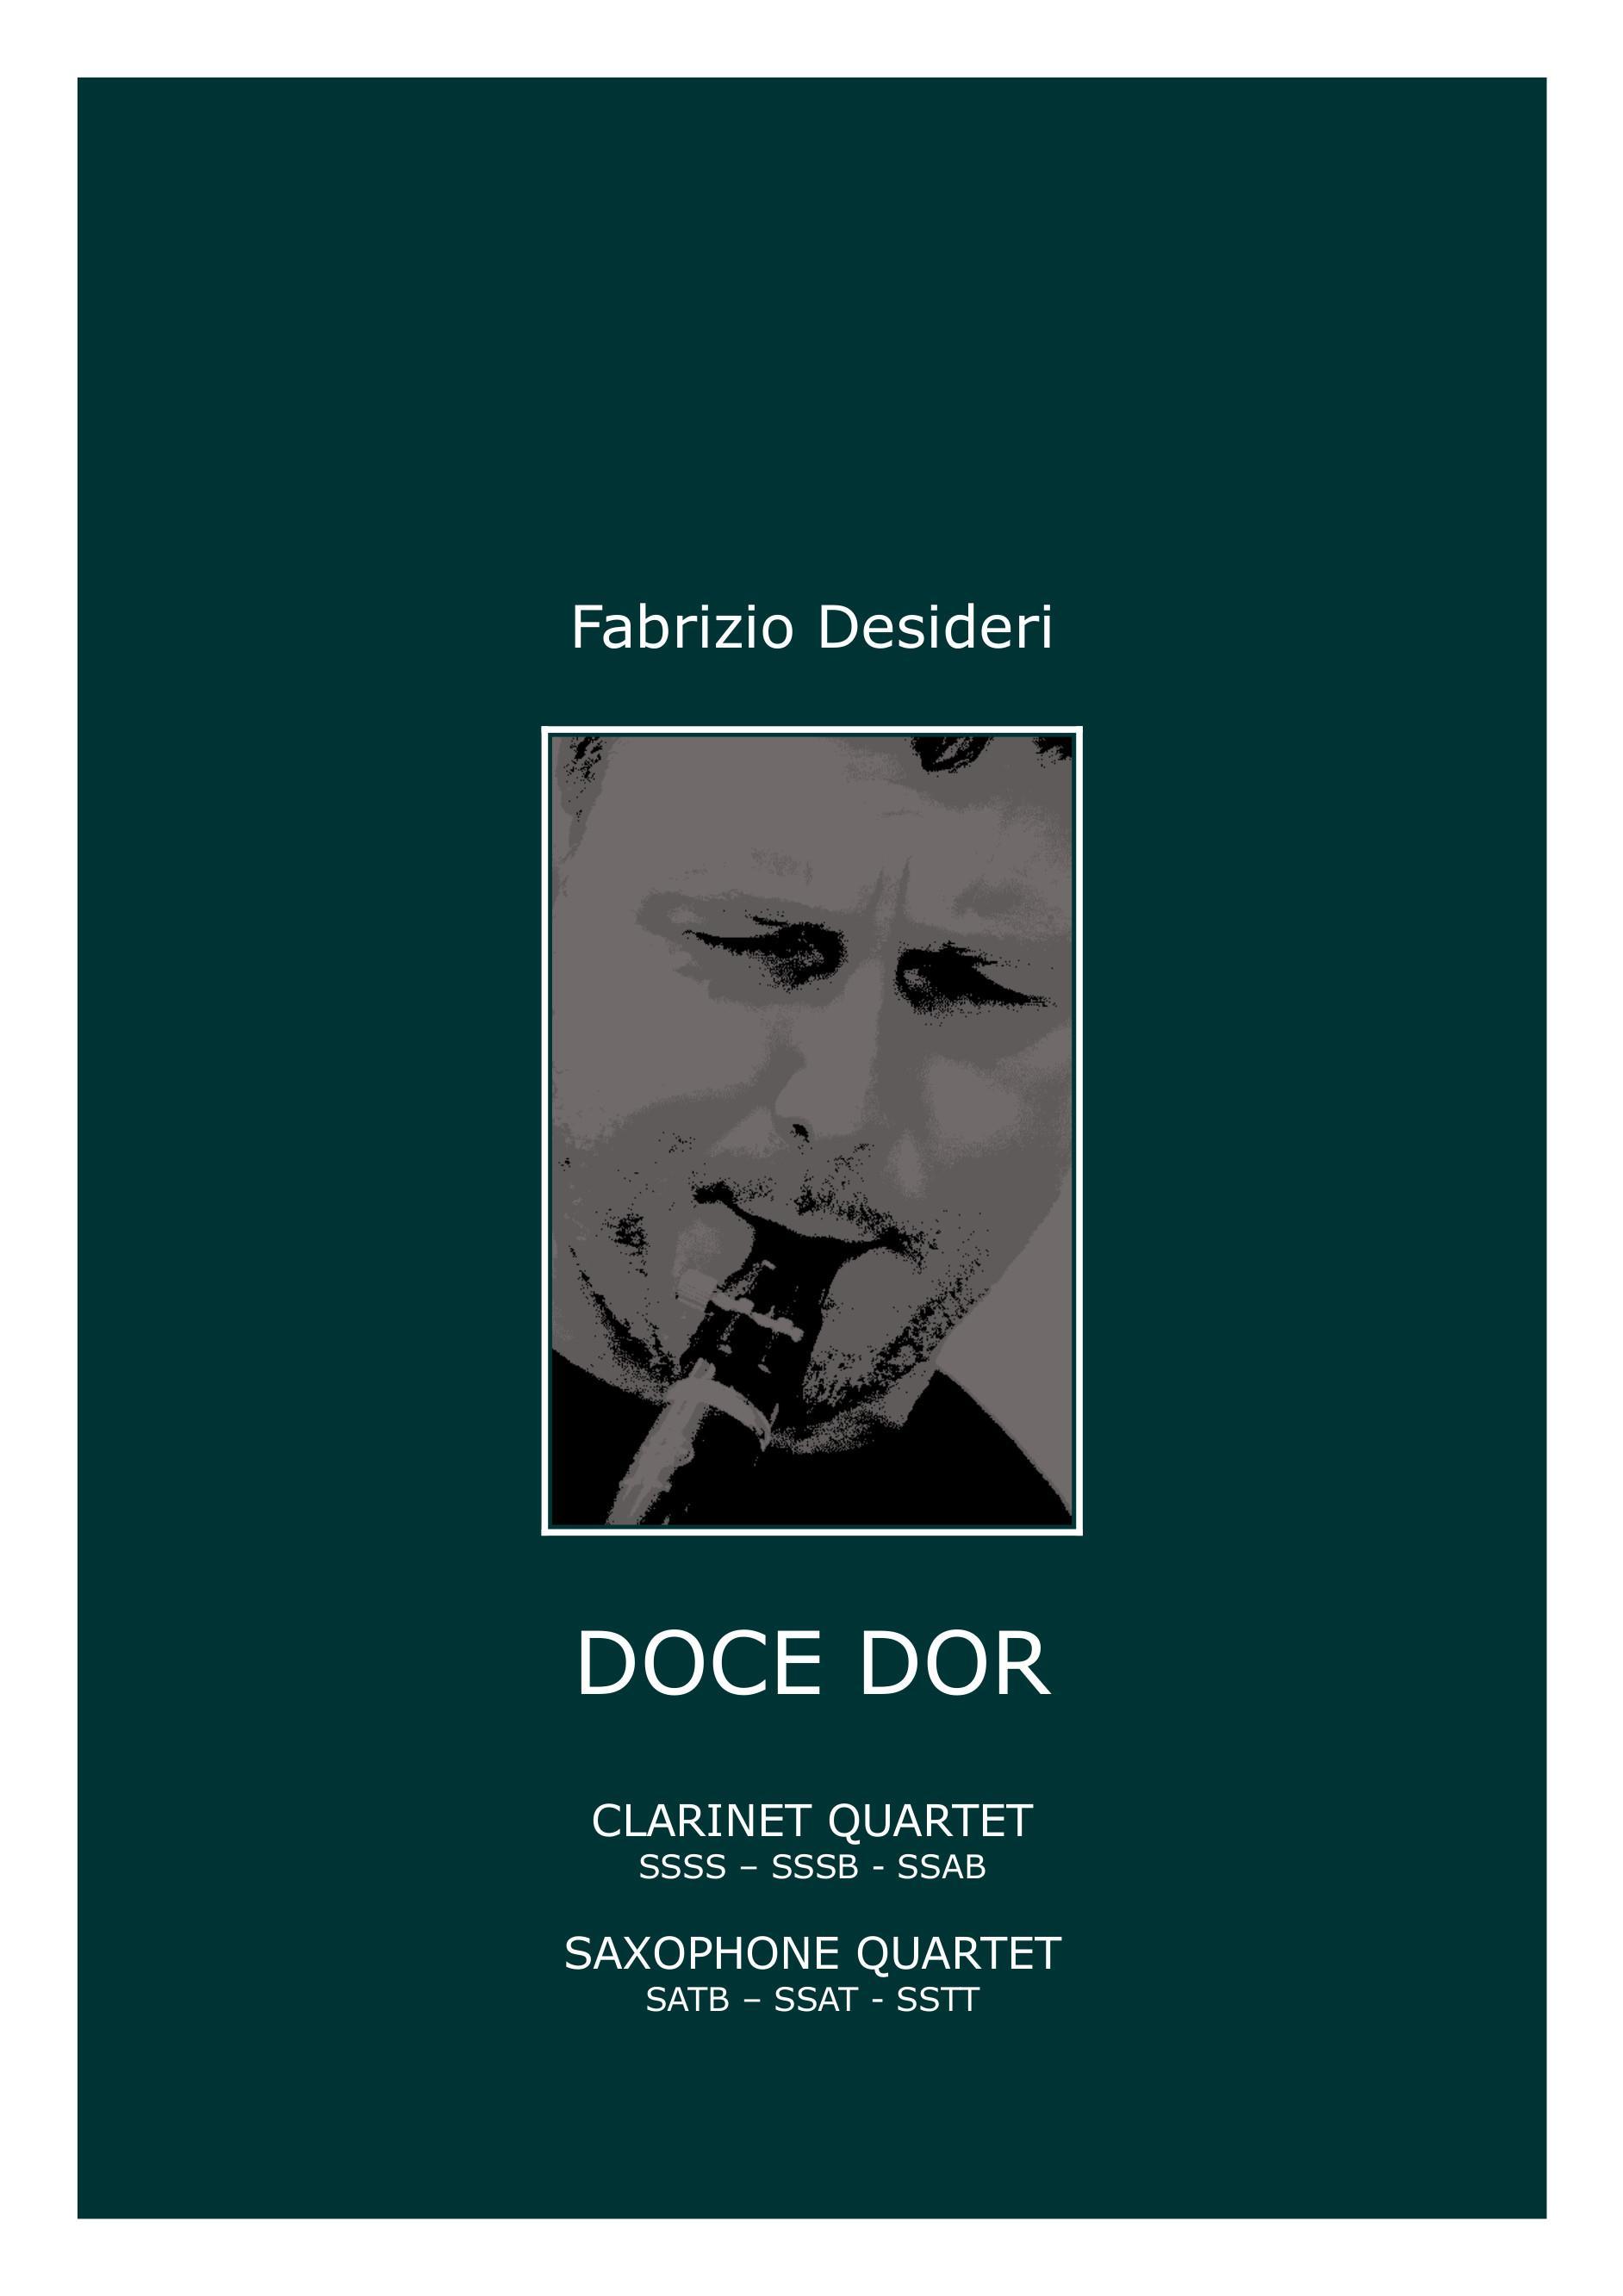 Doce Dor